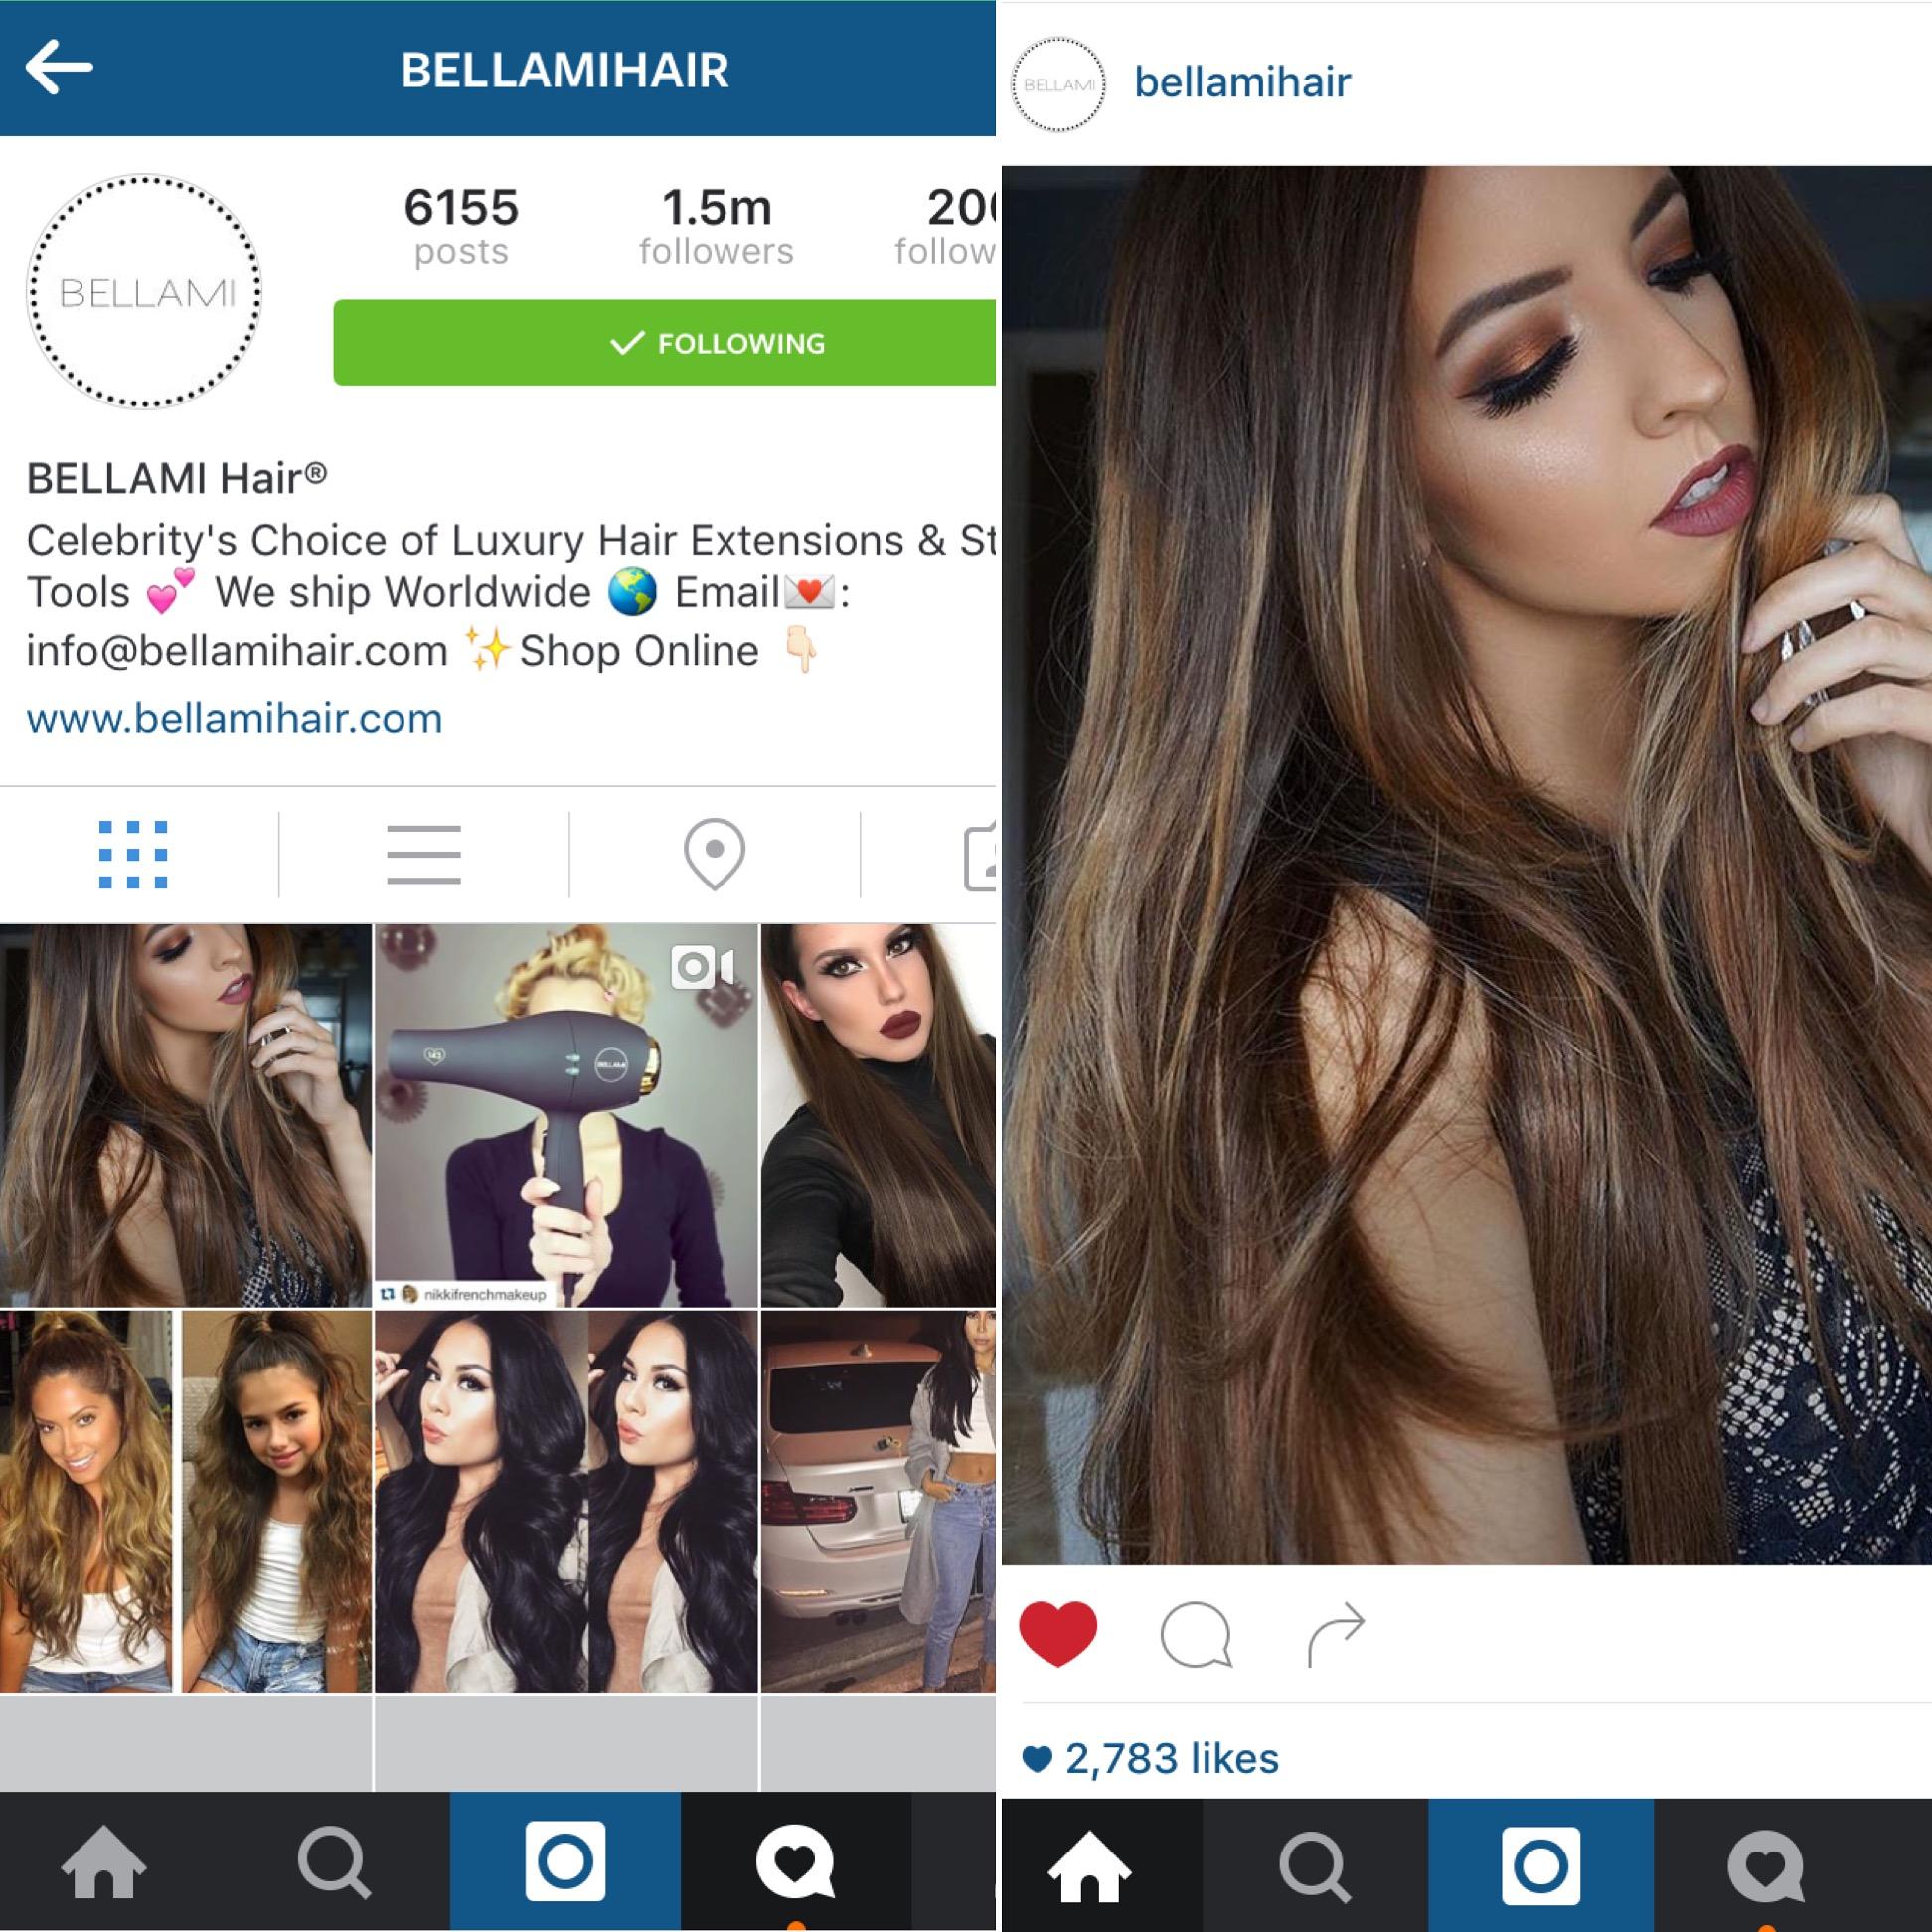 Bellami Hair Instagram Feature